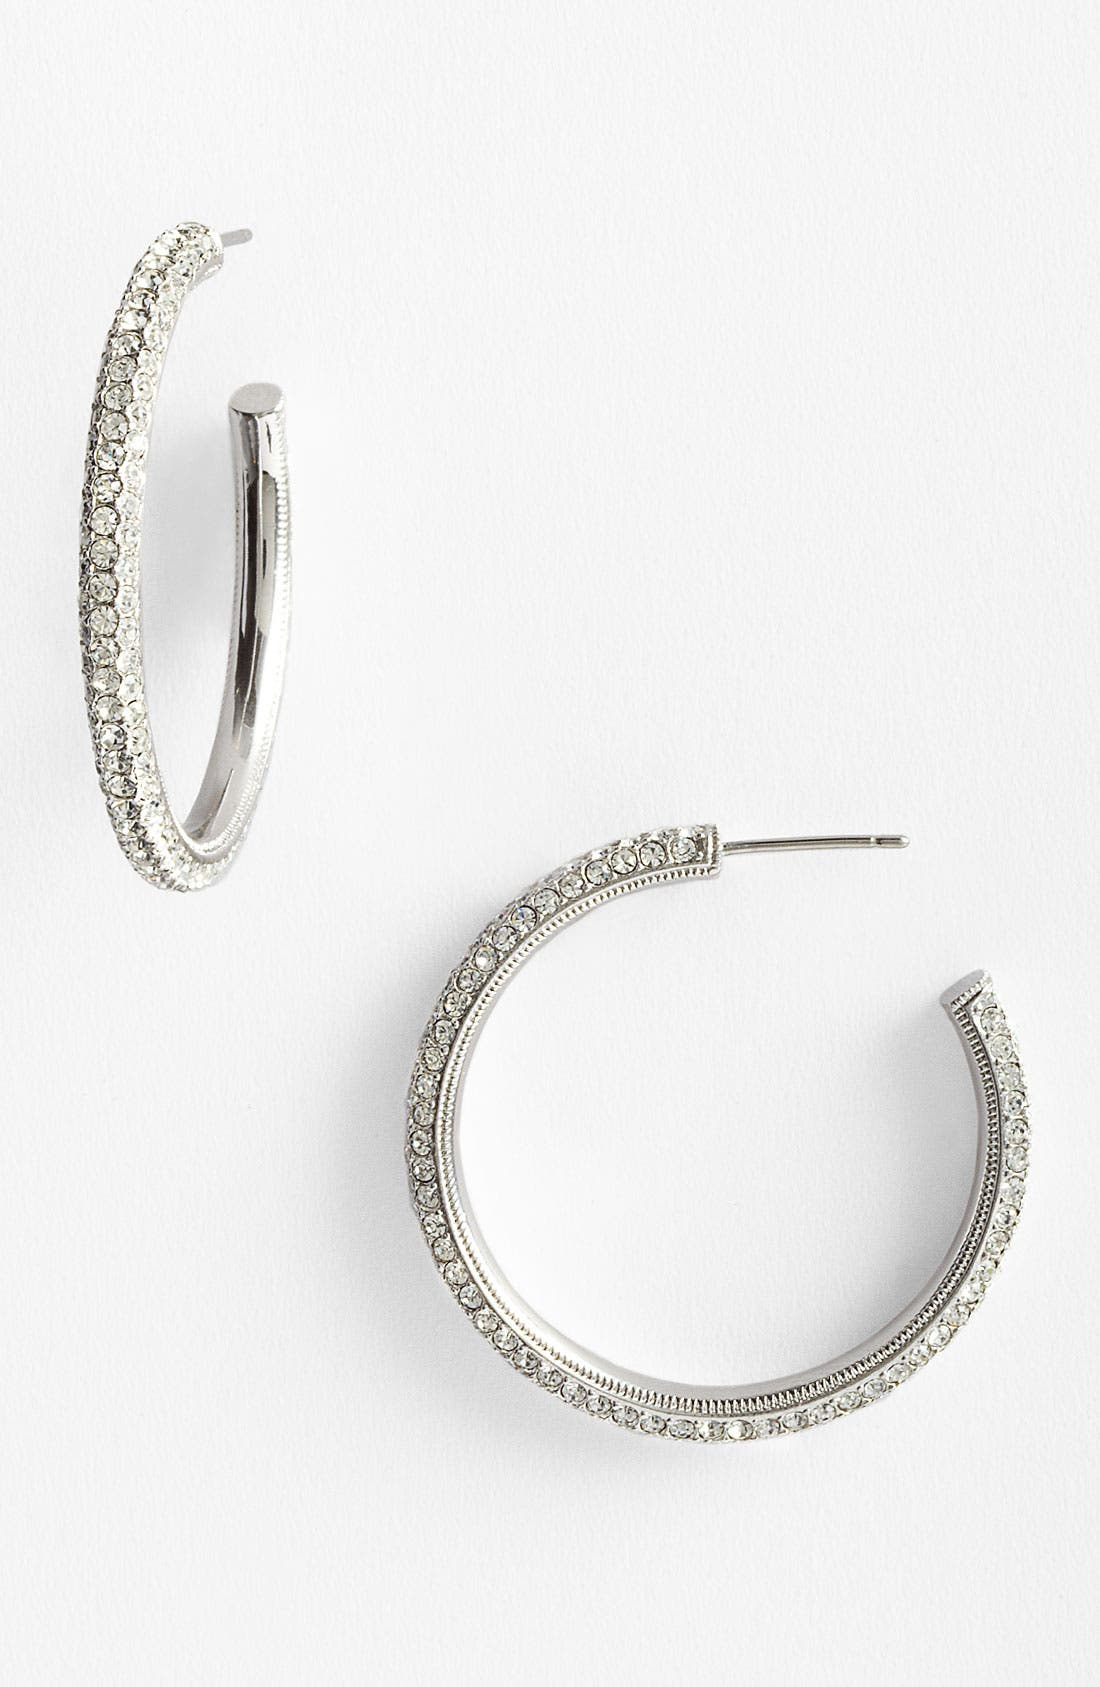 Alternate Image 1 Selected - Nadri 'Small Pavé Bombe' Hoop Earrings